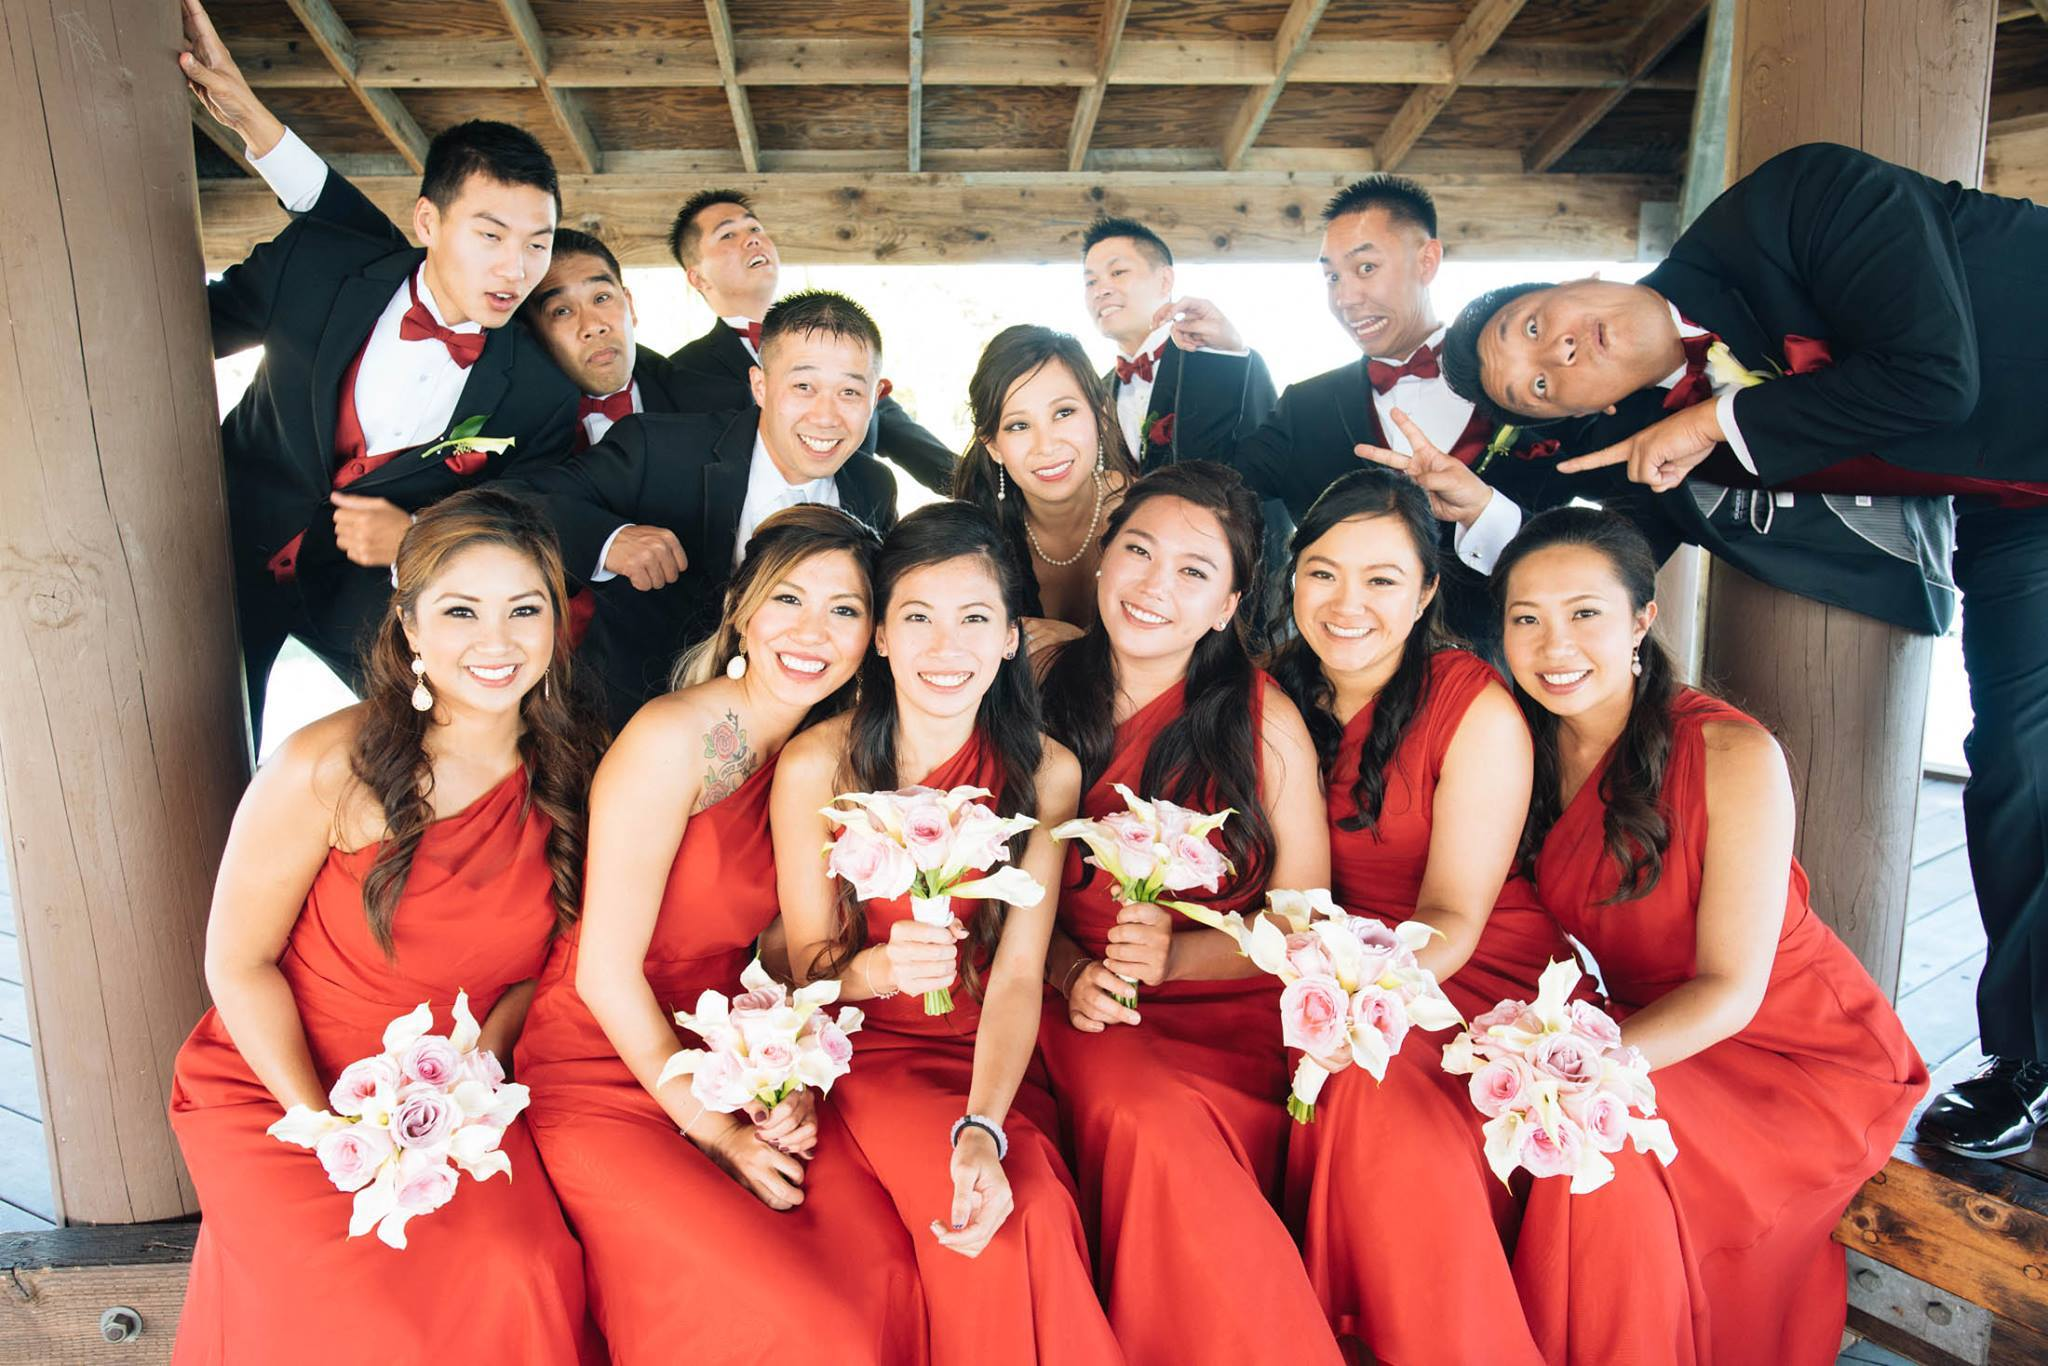 KennyJCStudio - Wedding Day Photography03.jpg